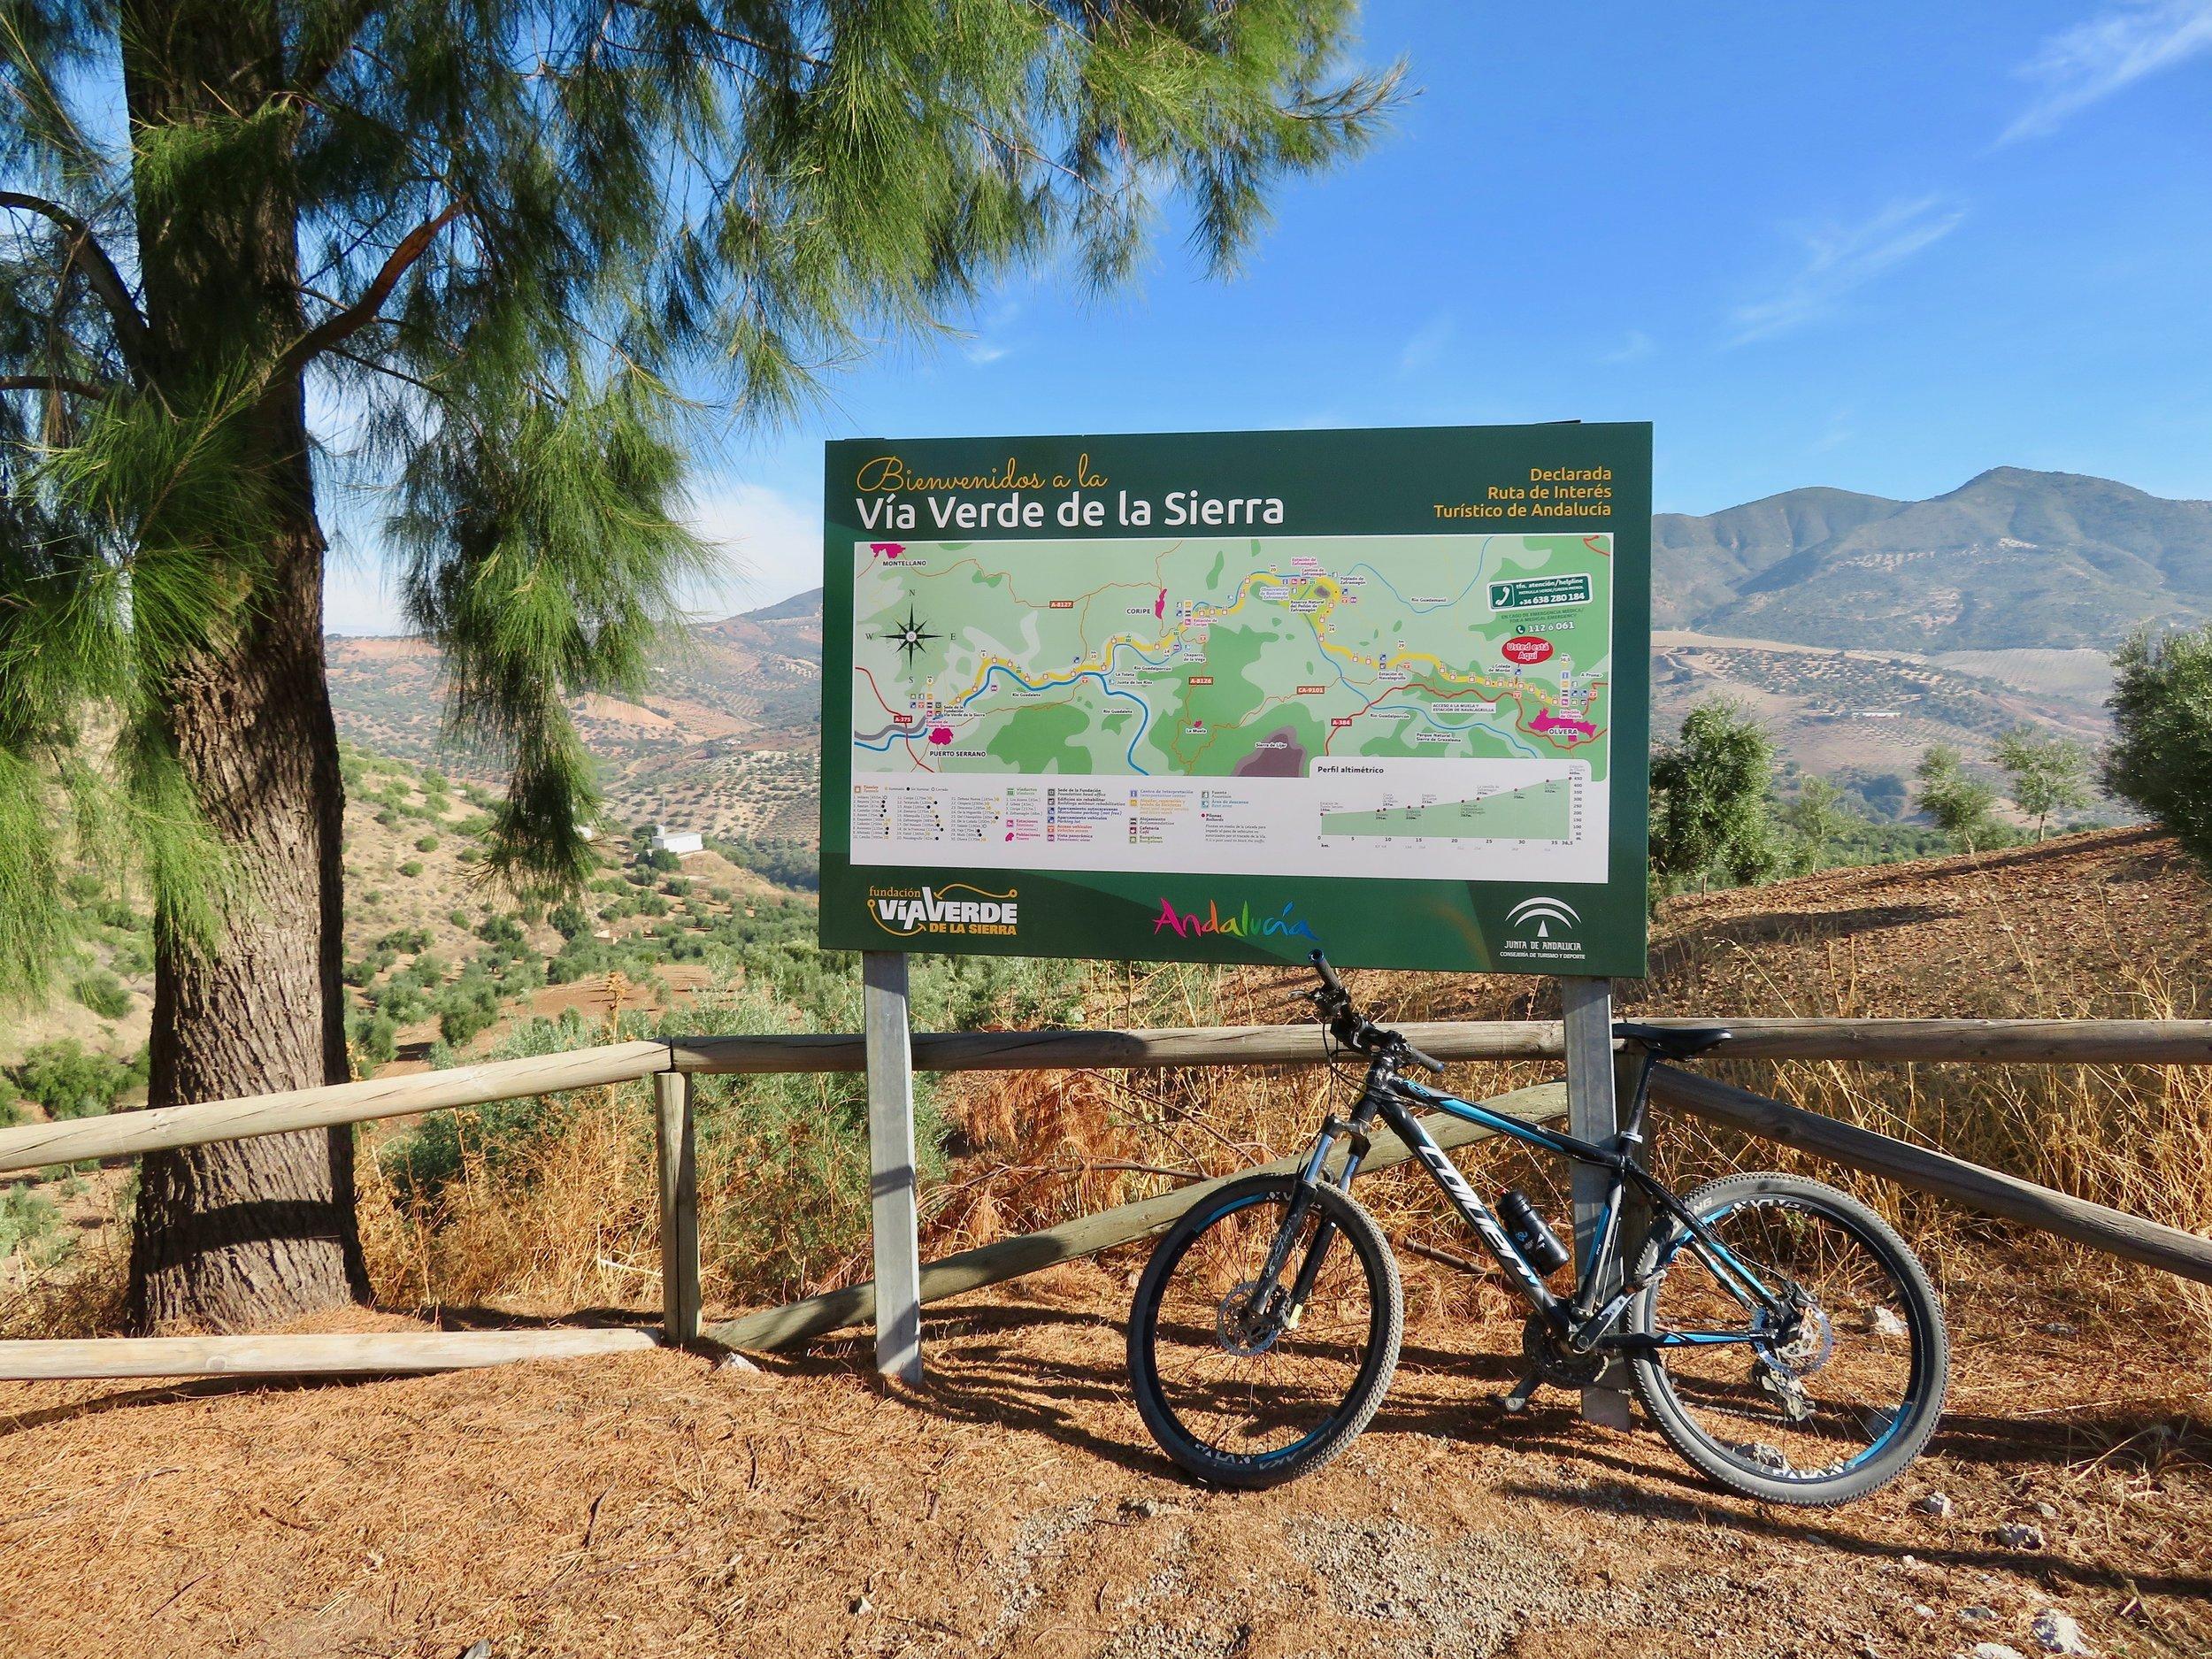 Rail Trail: Via Verde de la Sierra